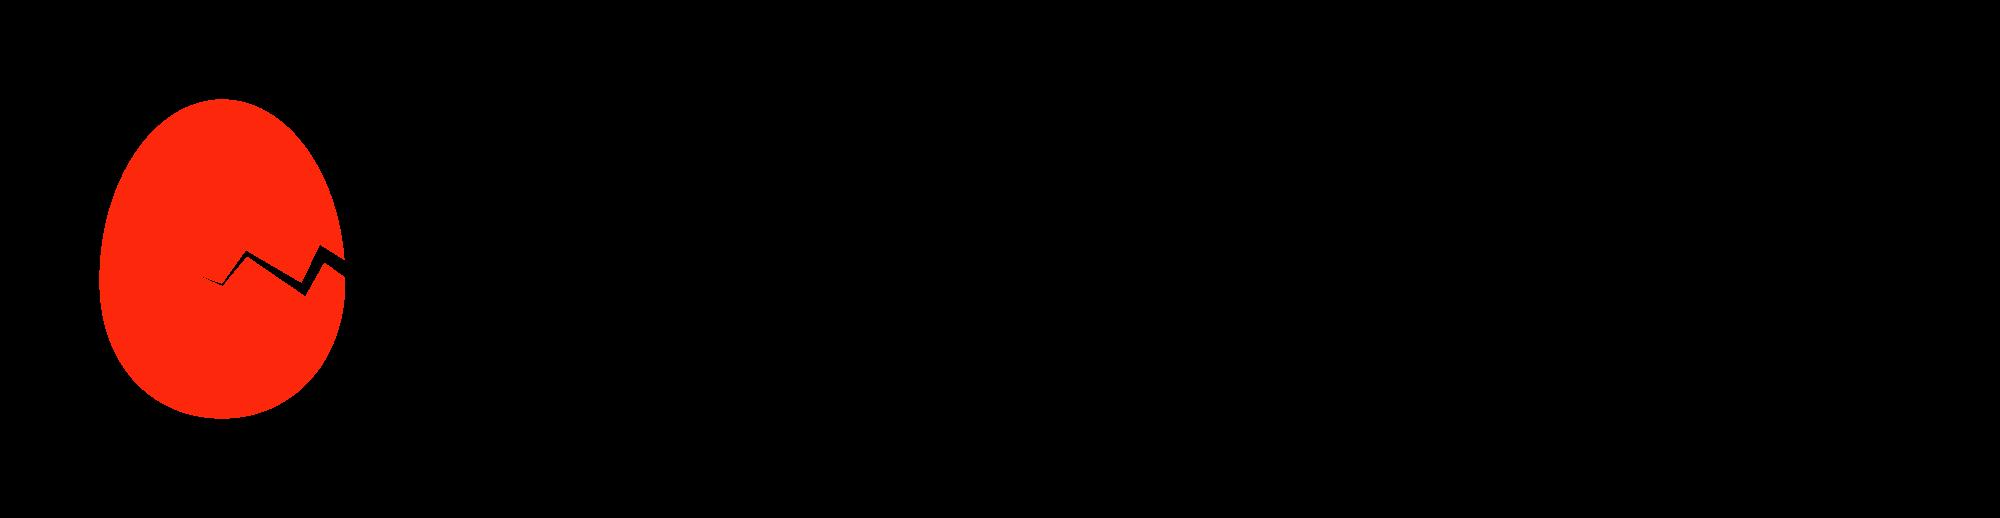 hatch-editorial-services-logo-2